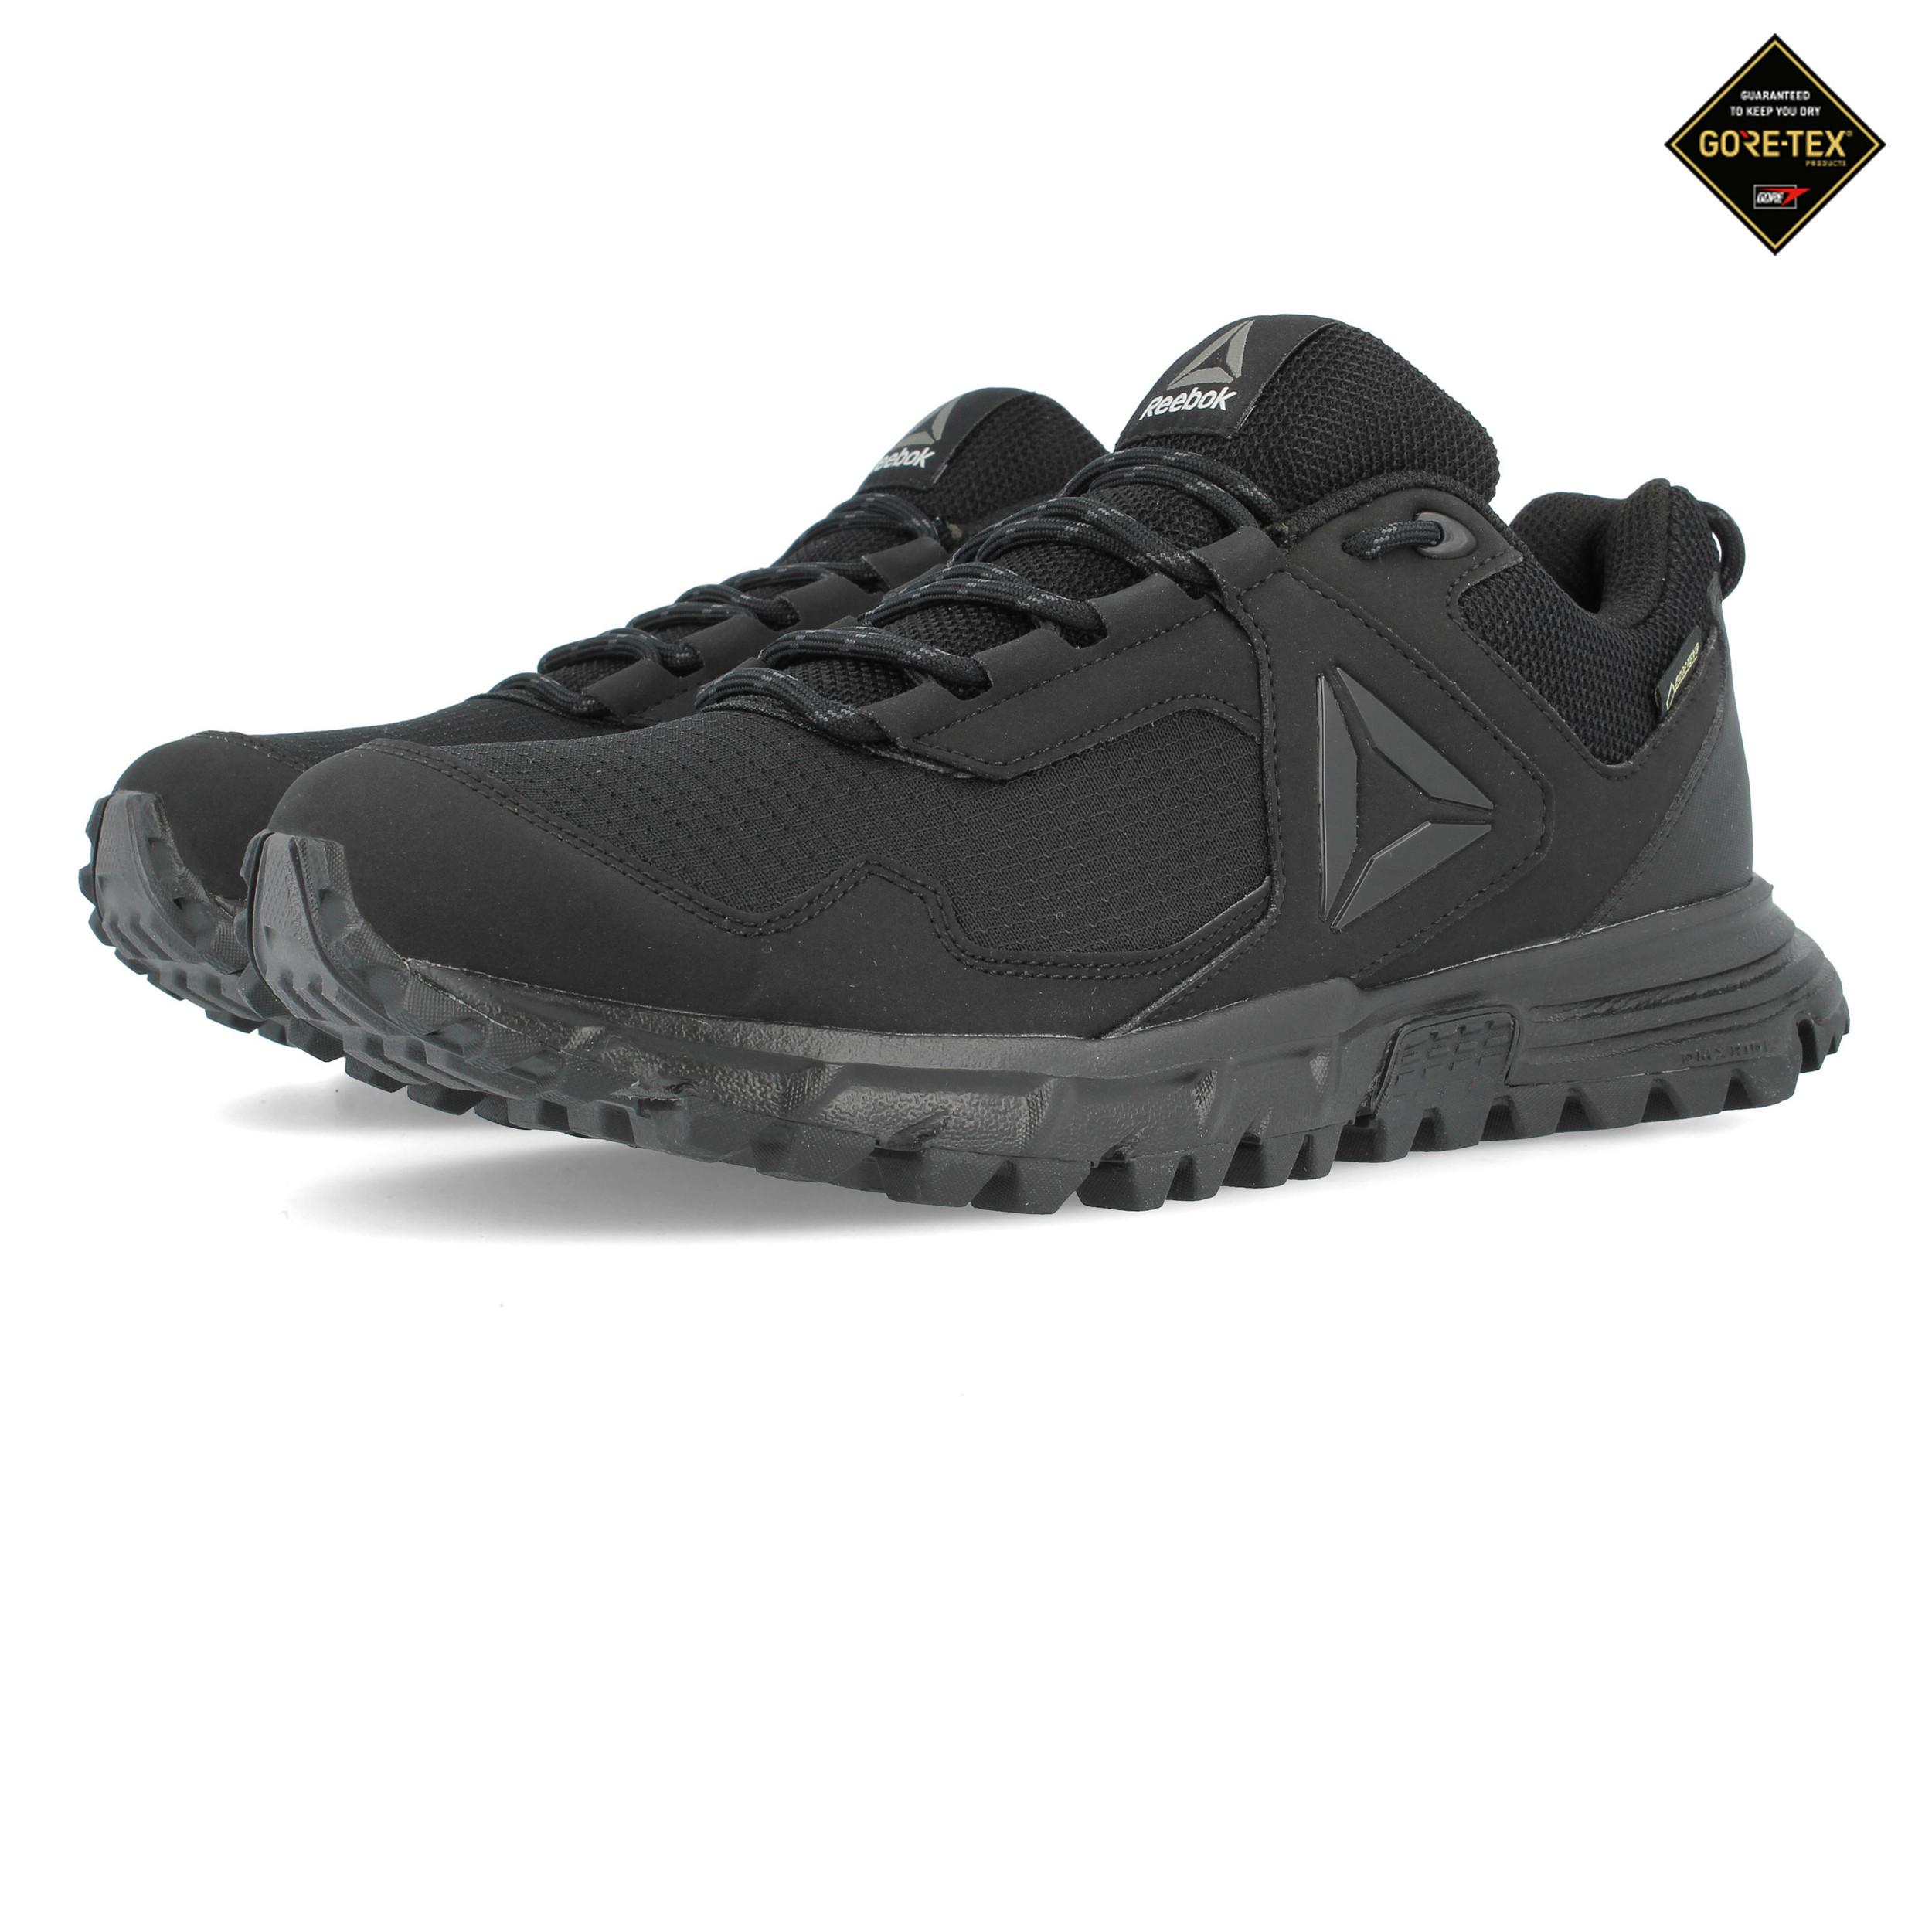 4772cf454185c Reebok Mens Sawcut 5.0 GORE-TEX Walking Shoe Black Sports Outdoors Trainers